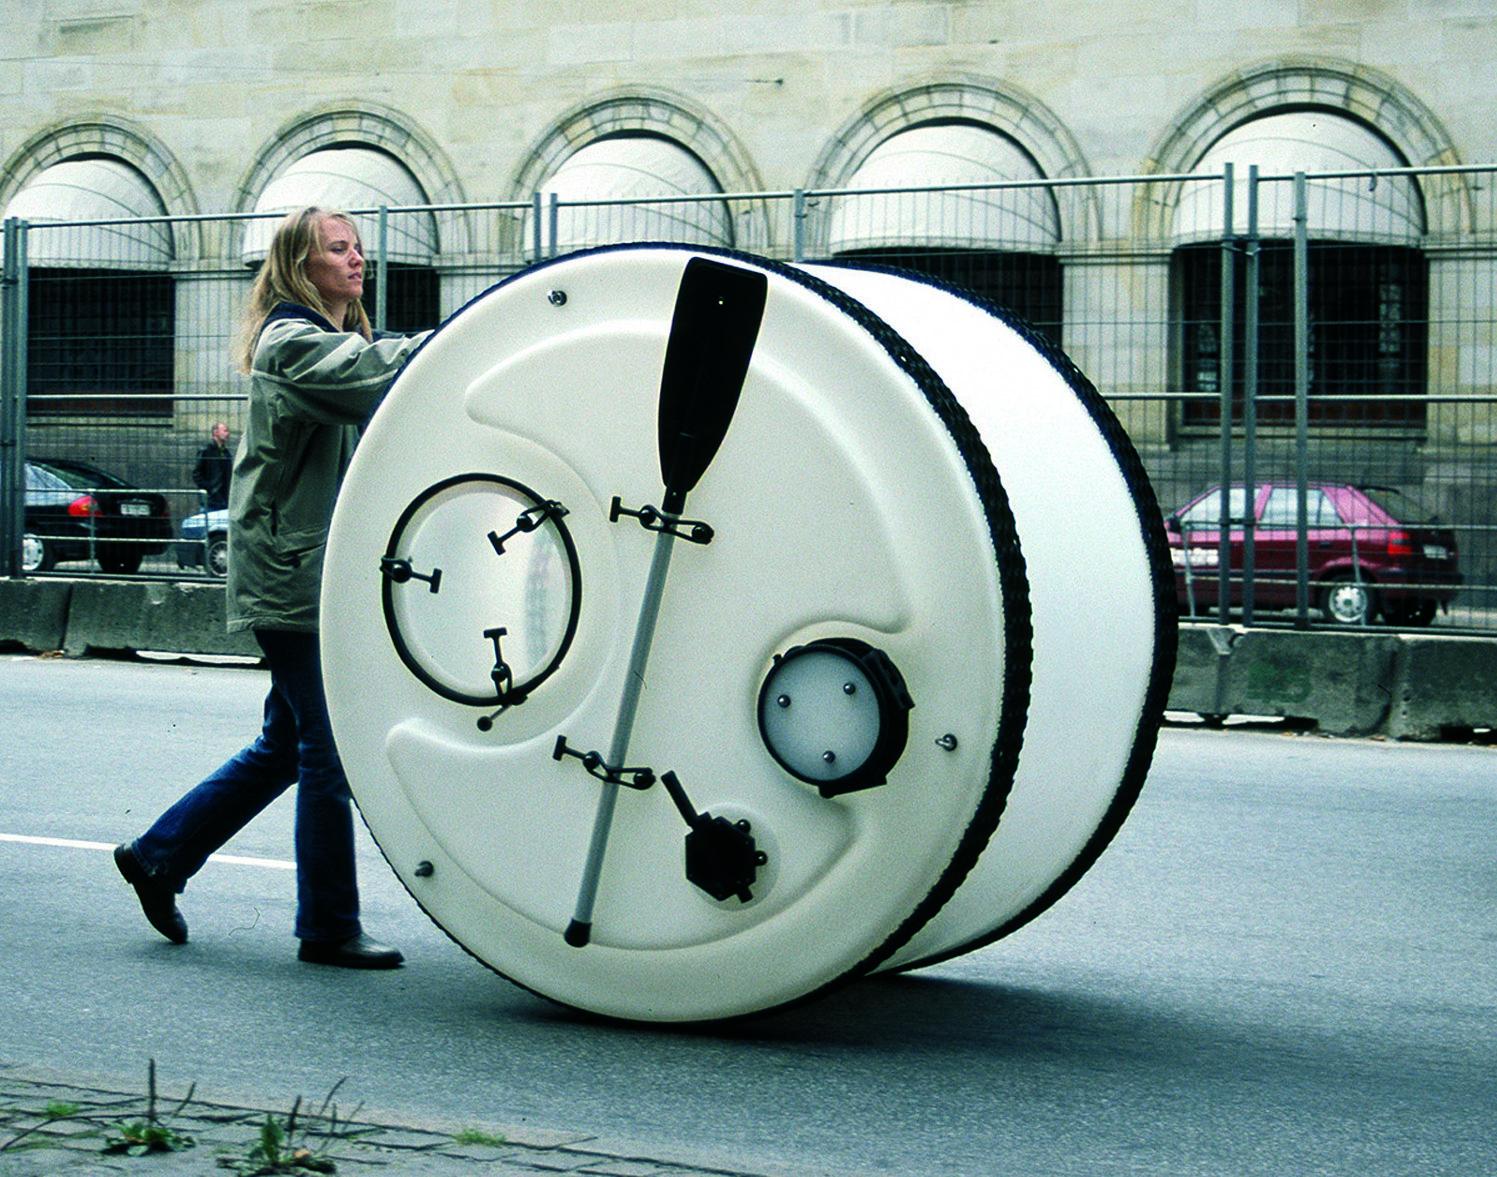 Photo du projet Snail Shell System  de N55 (Ion Sørvin)